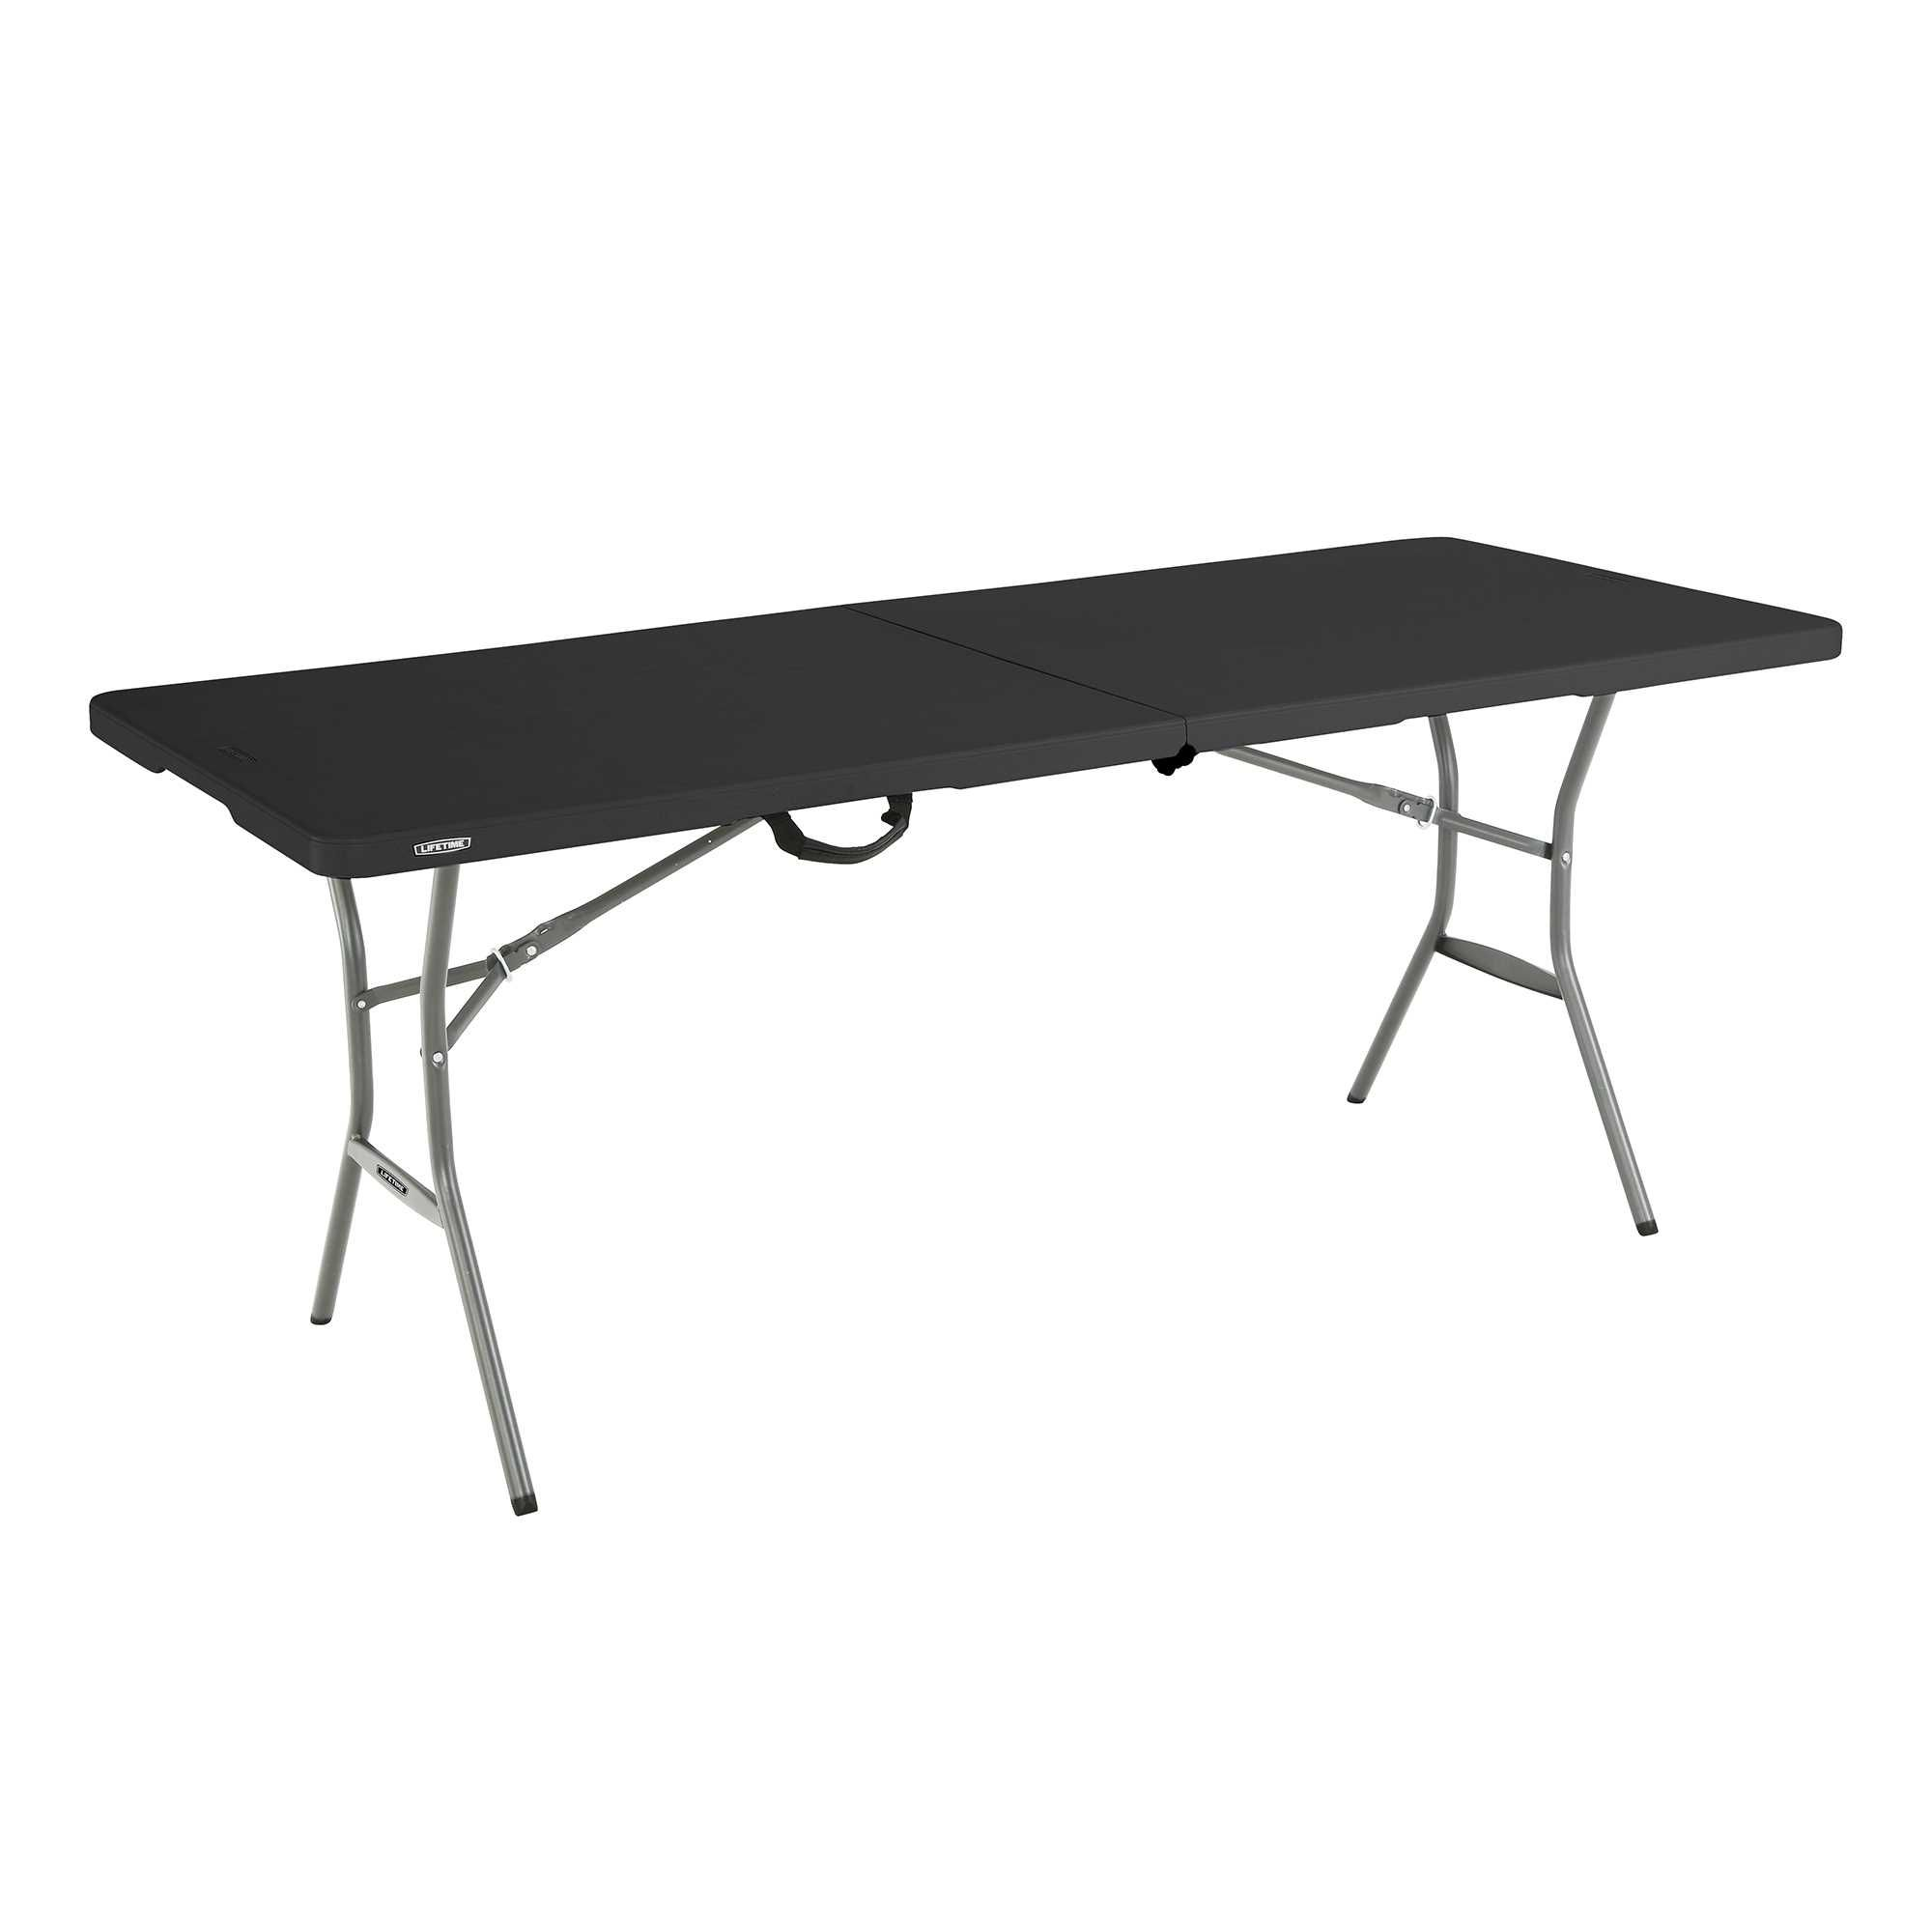 Lifetime 6 Light Commercial Fold In Half Table Bjs Wholesale Club